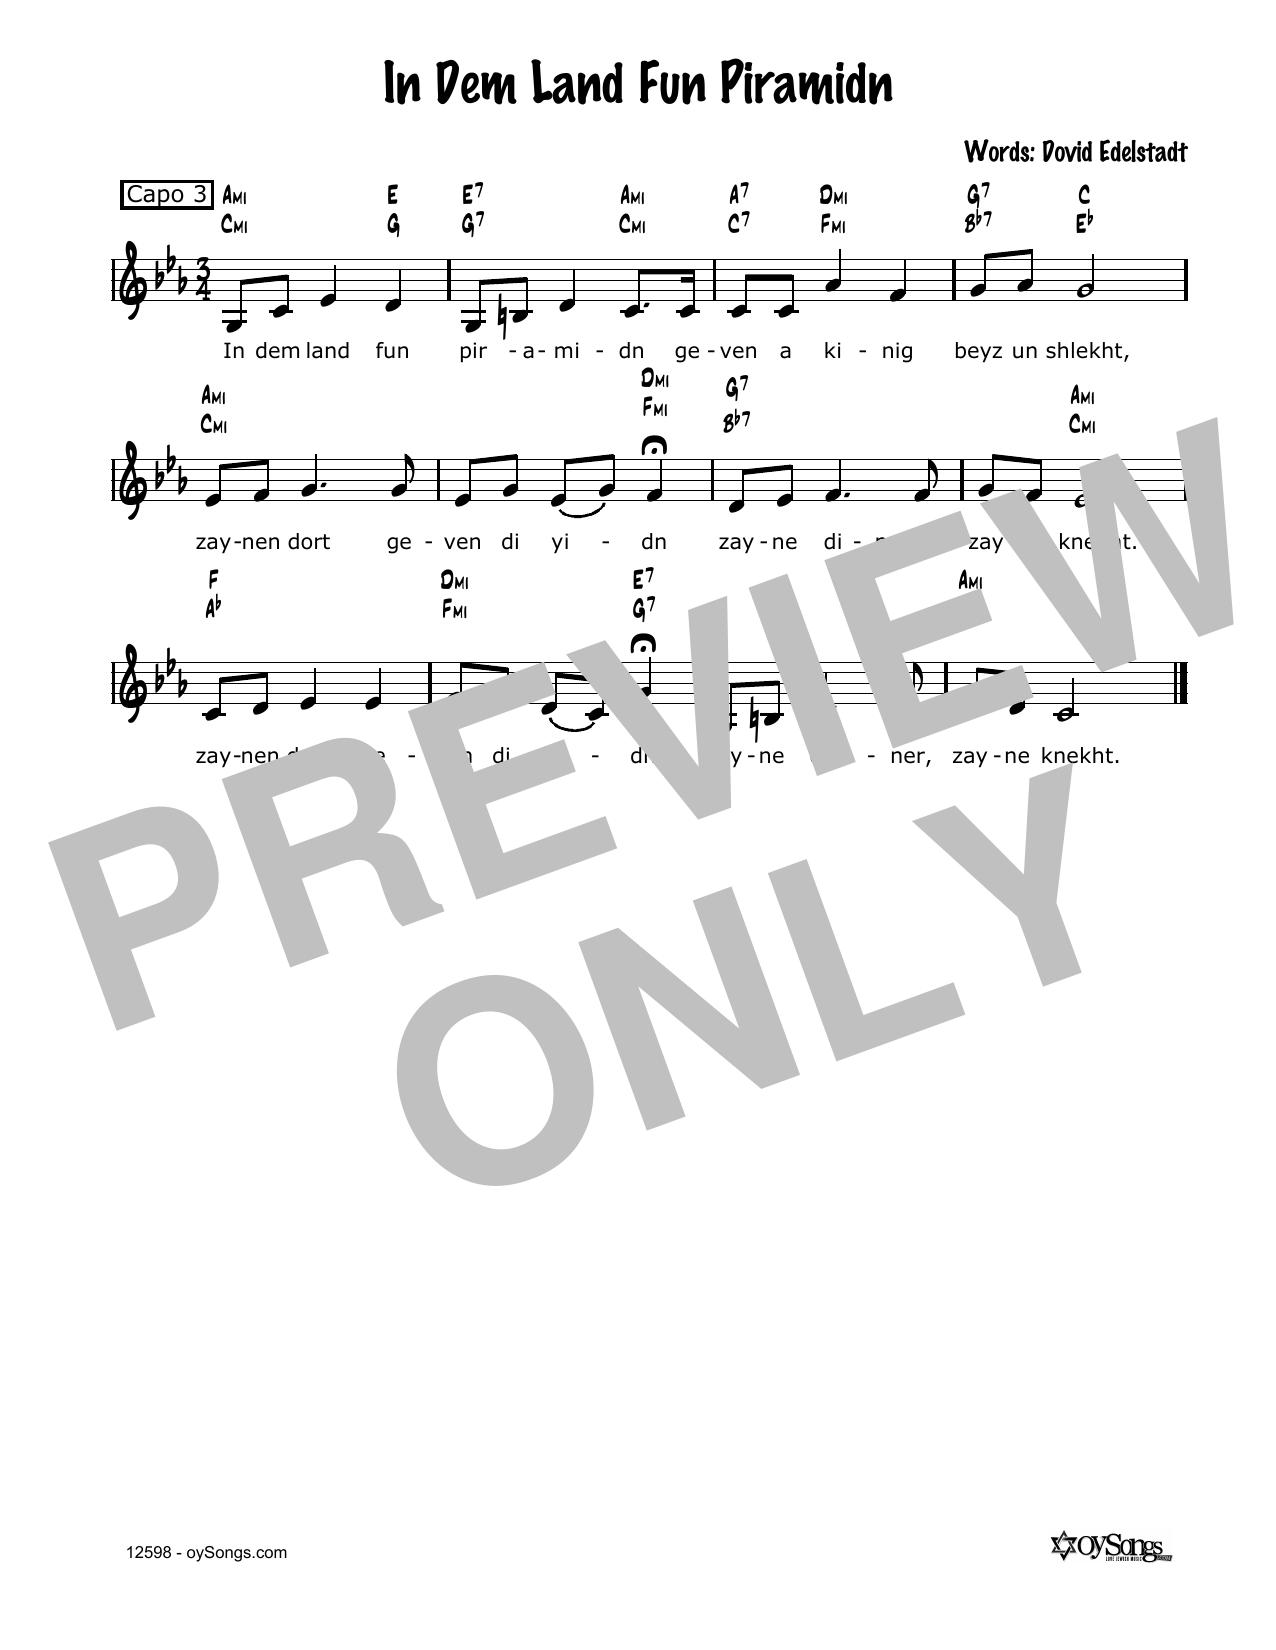 Cindy Paley In Dem Land Fun Piramidn sheet music notes and chords. Download Printable PDF.